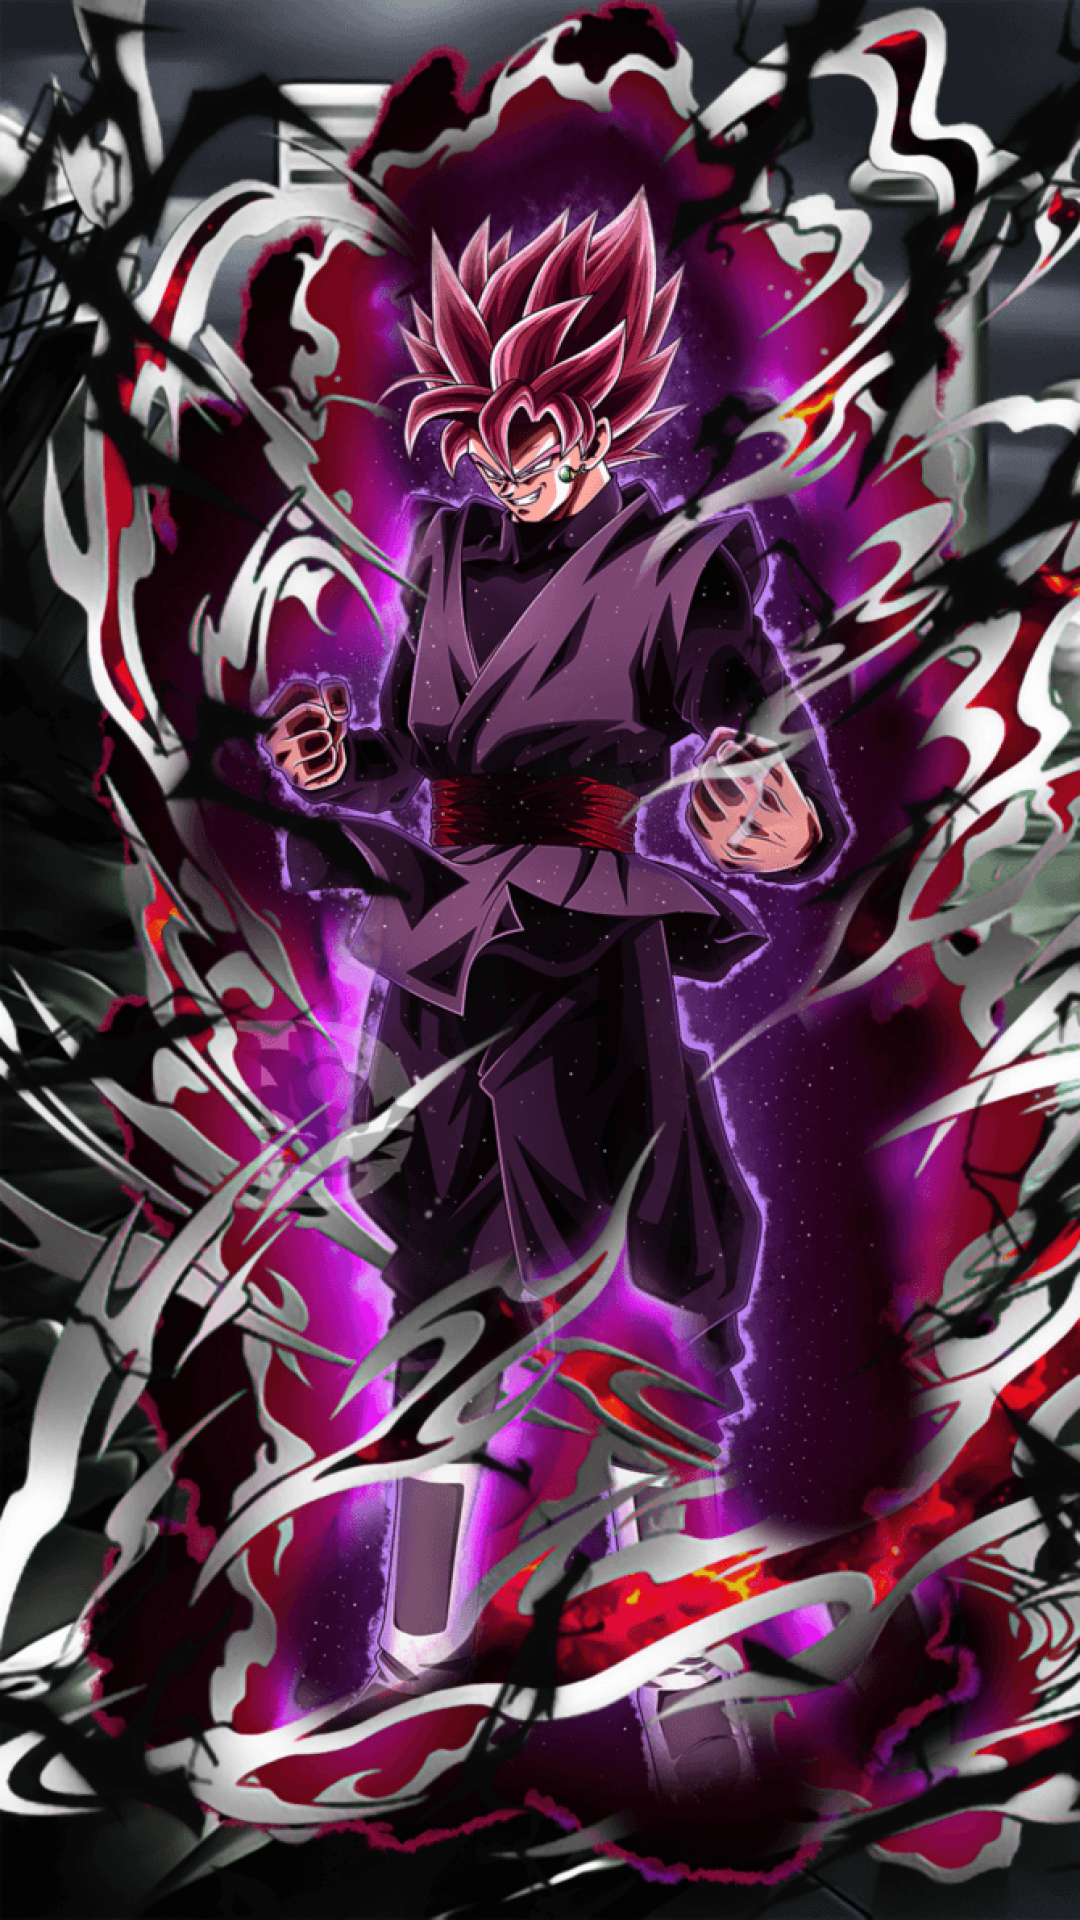 Black Goku Android Iphone Desktop Hd Backgrounds Wallpapers 1080p 4k 124206 Hd Anime Dragon Ball Super Dragon Ball Super Manga Dragon Ball Artwork